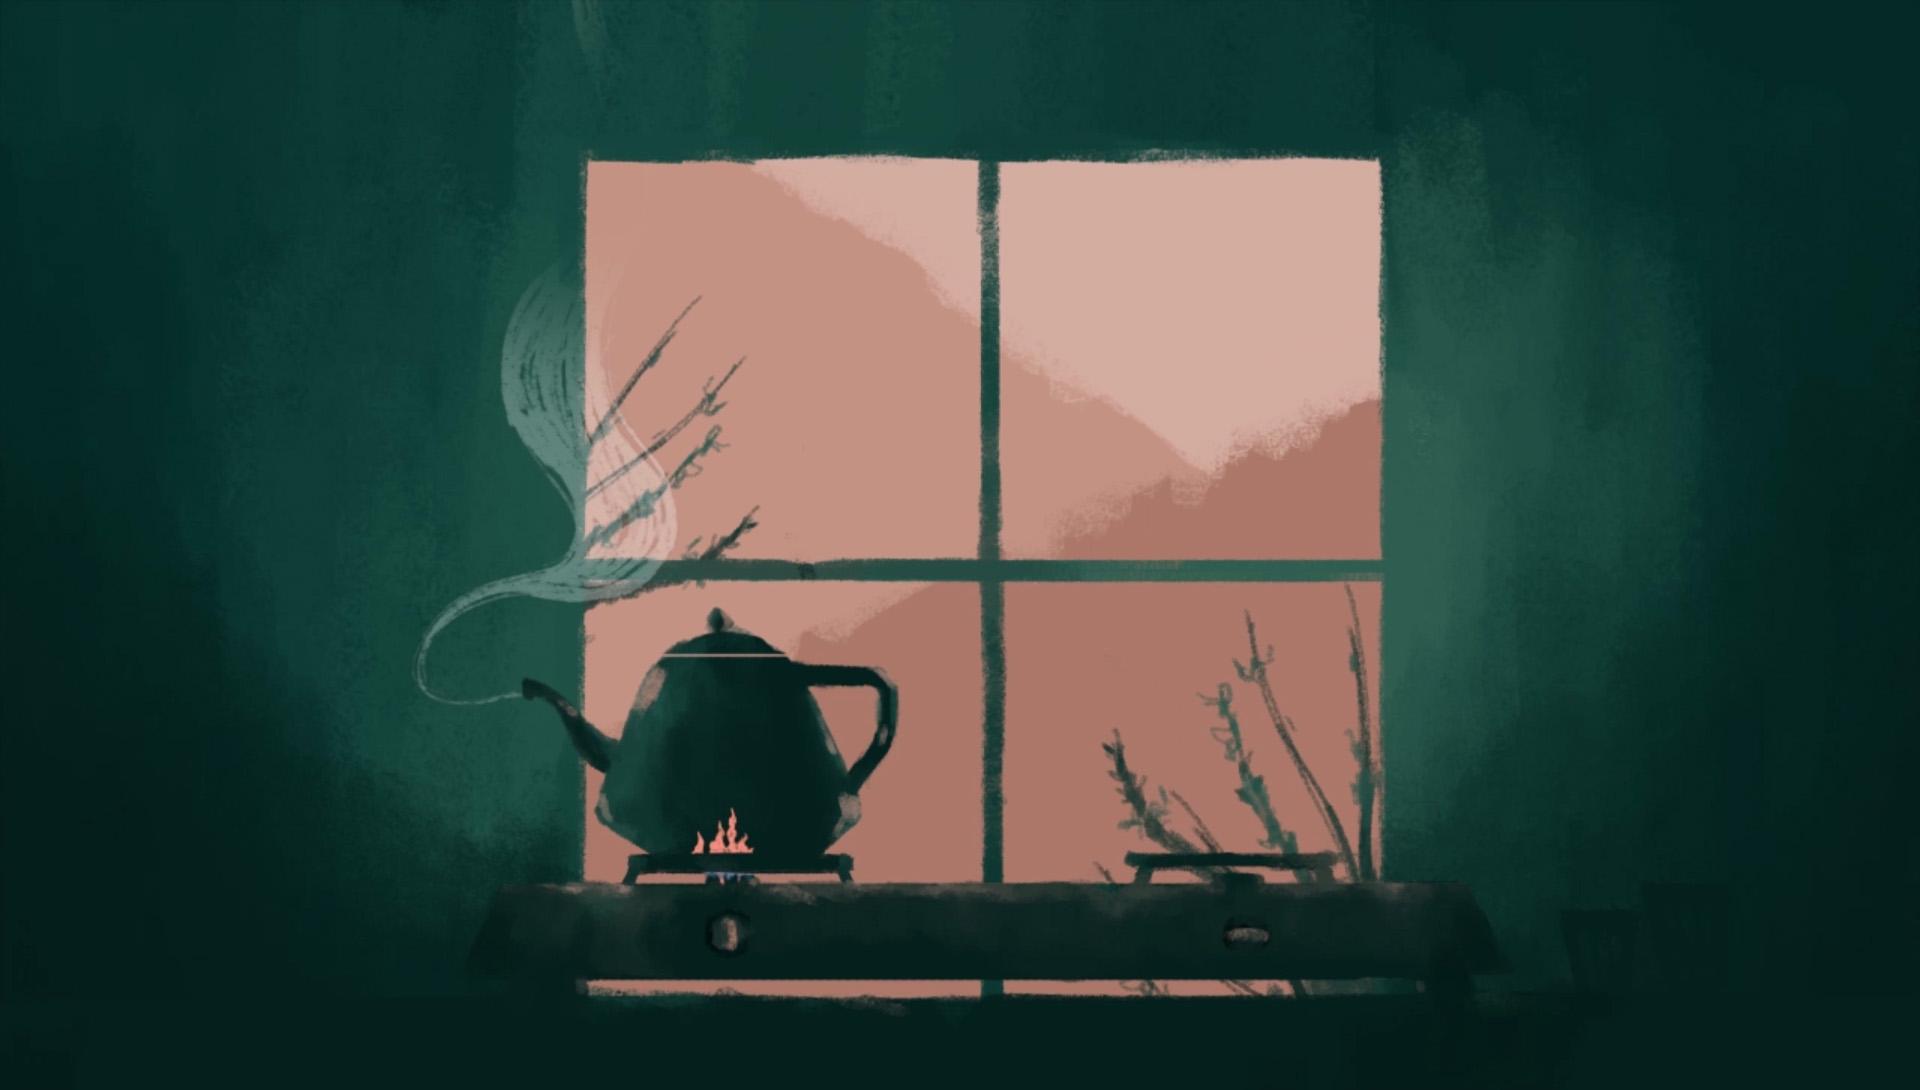 tea pot illustration